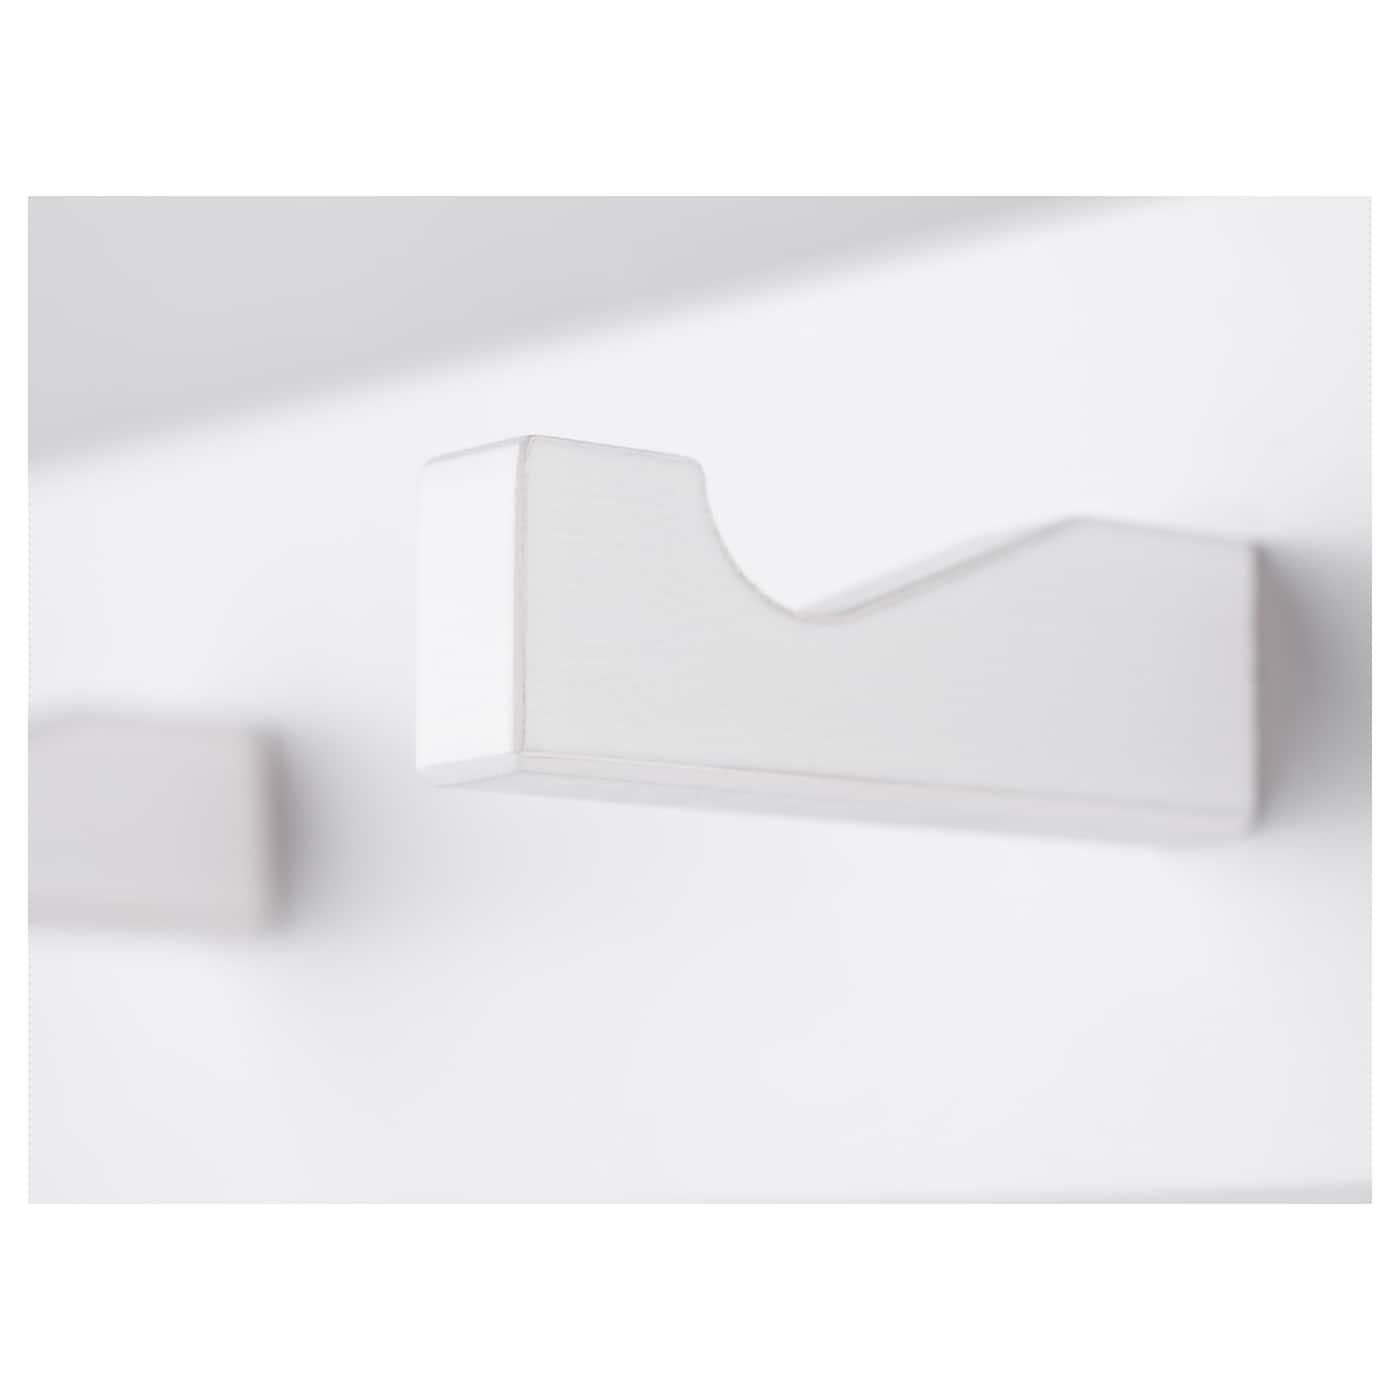 Kubbis pat re 3 crochets blanc ikea for Ikea patere